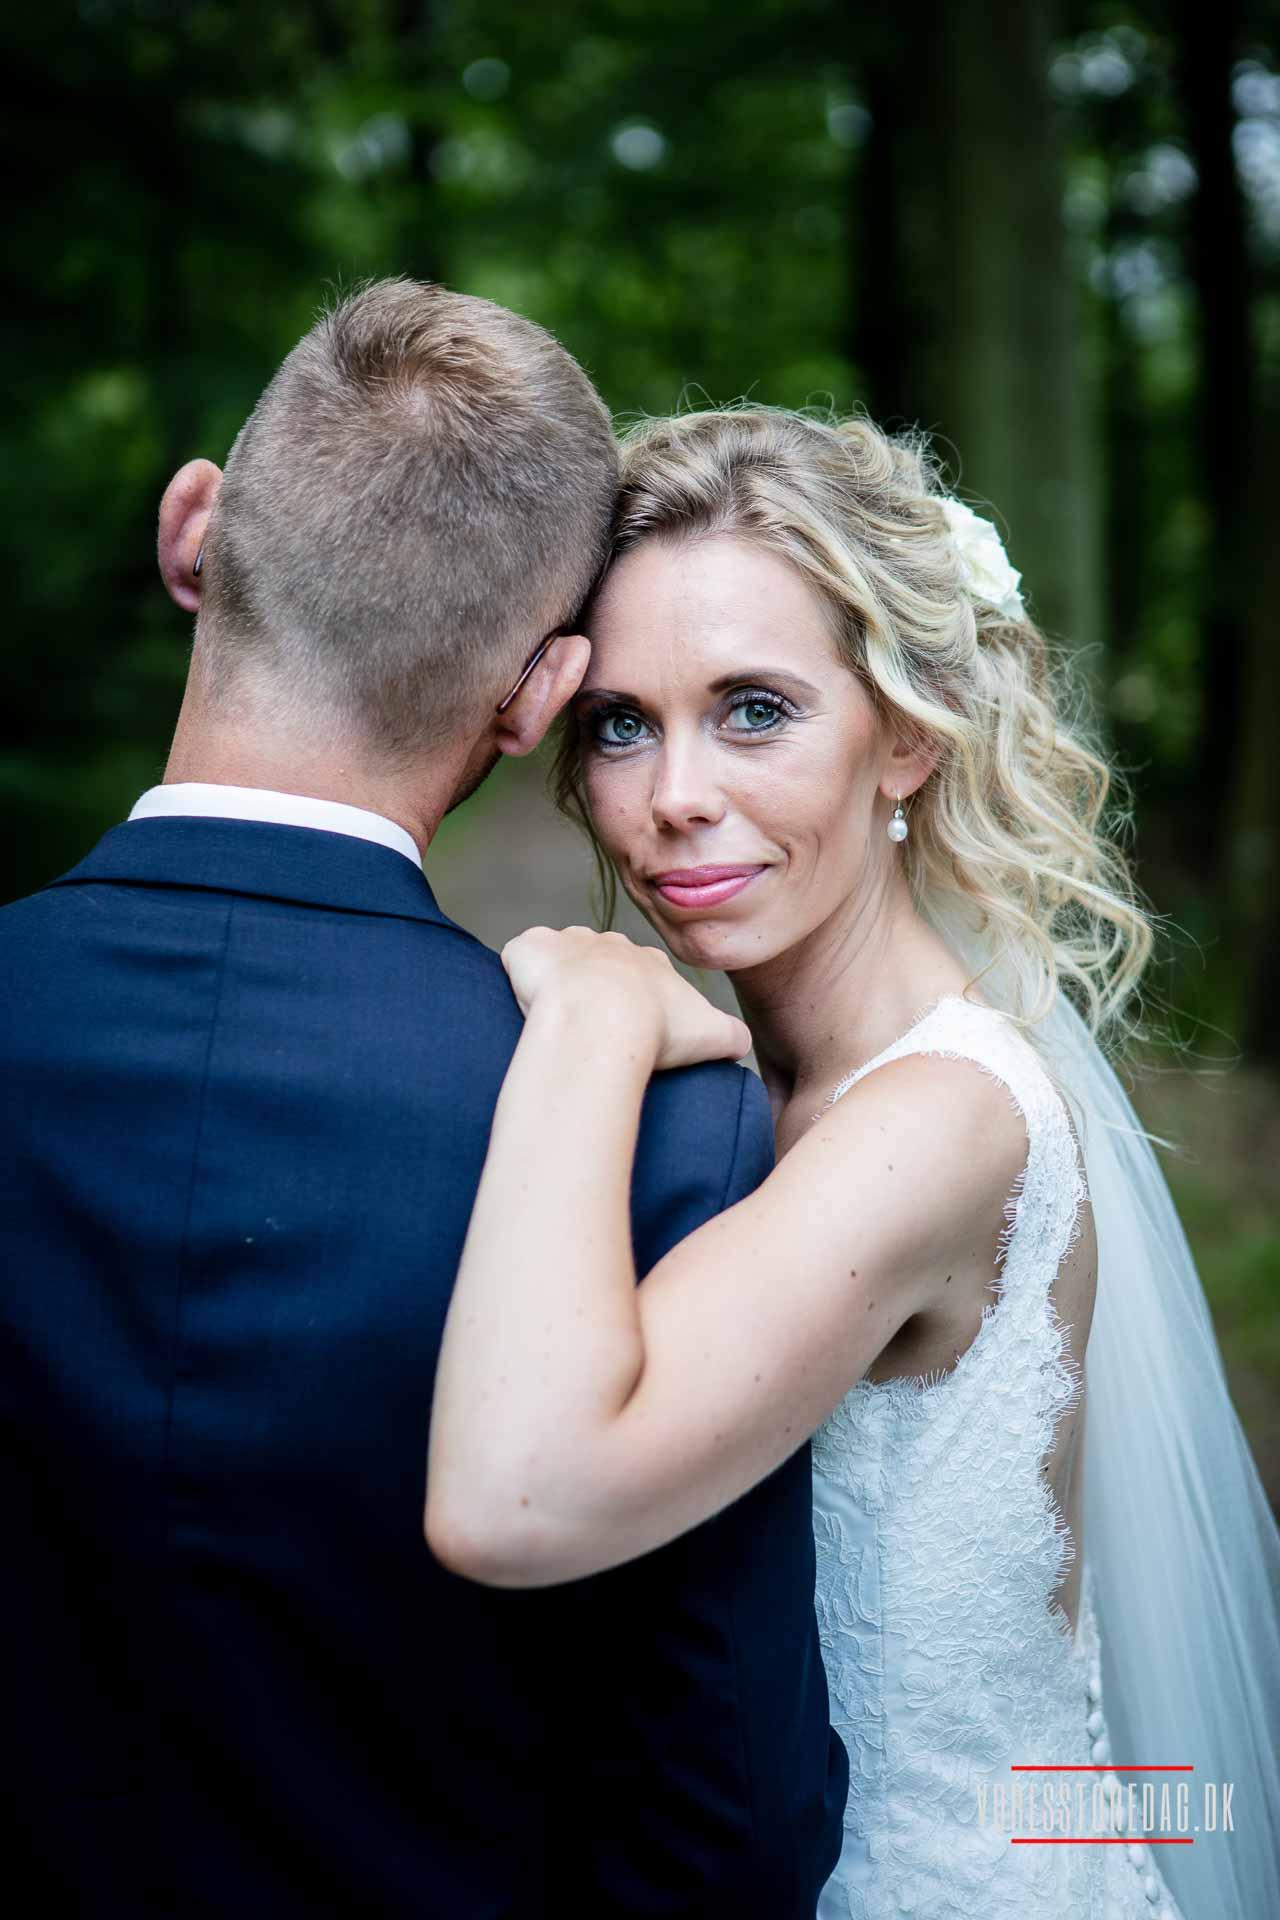 Romantisk Bryllup - Kolding - Haderslev